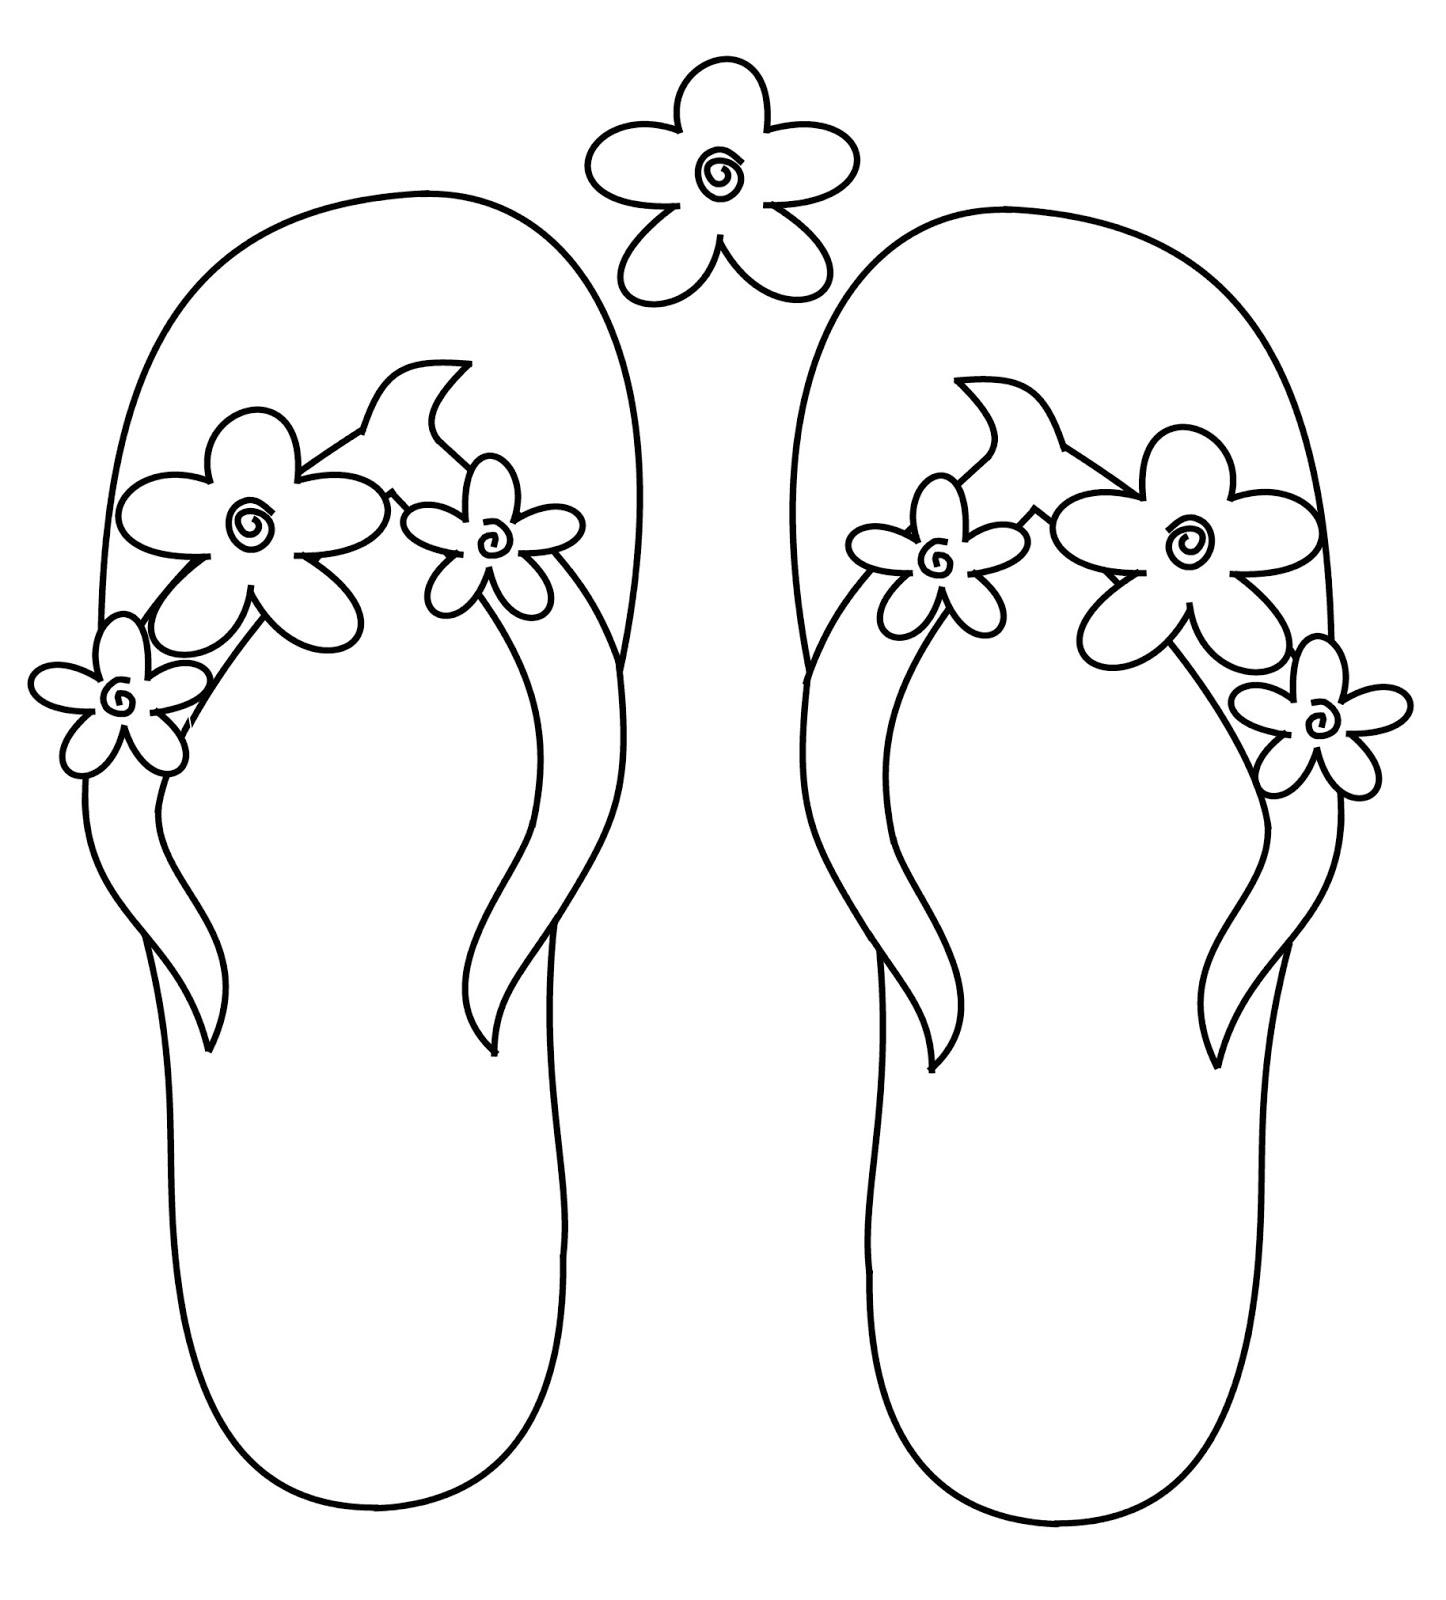 Scribbles Designs Challenge Blog: Freebie Friday: Flower